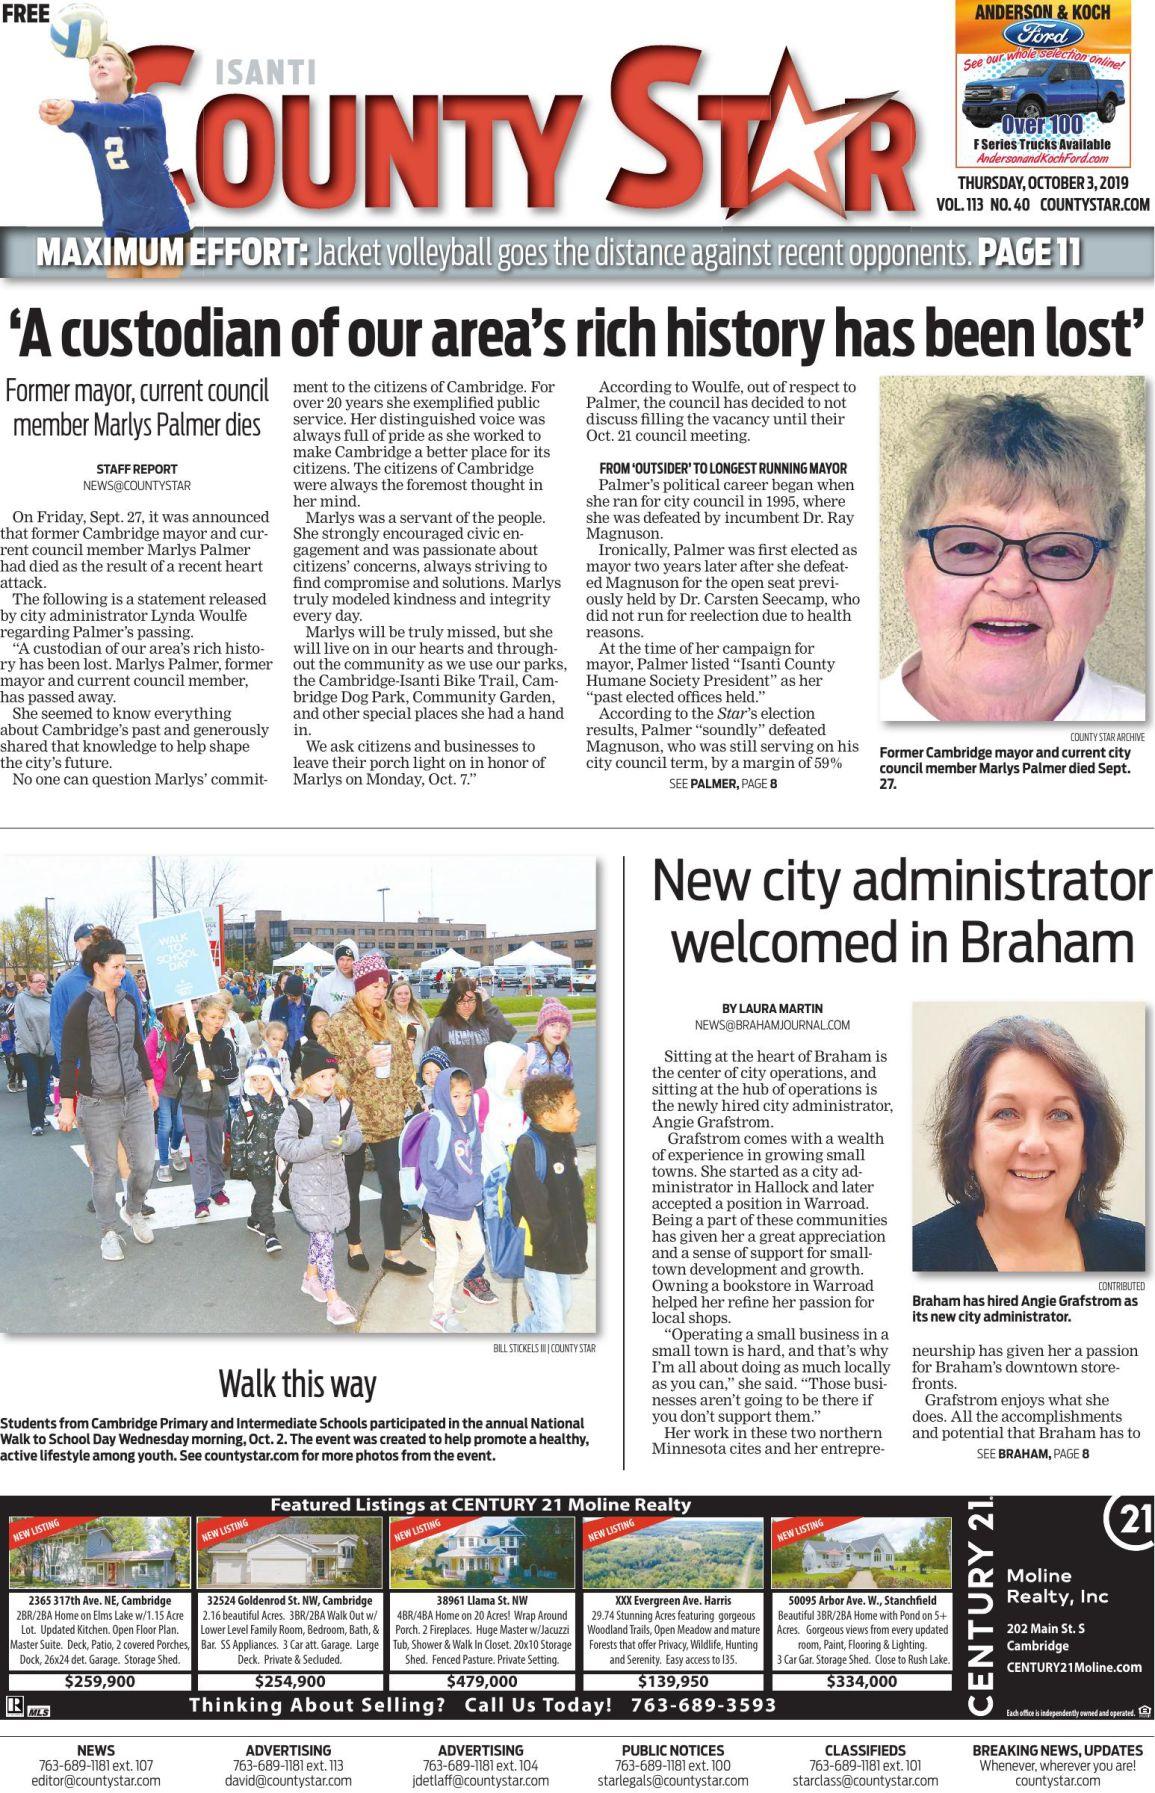 Isanti County Star October 3, 2019 e-edition